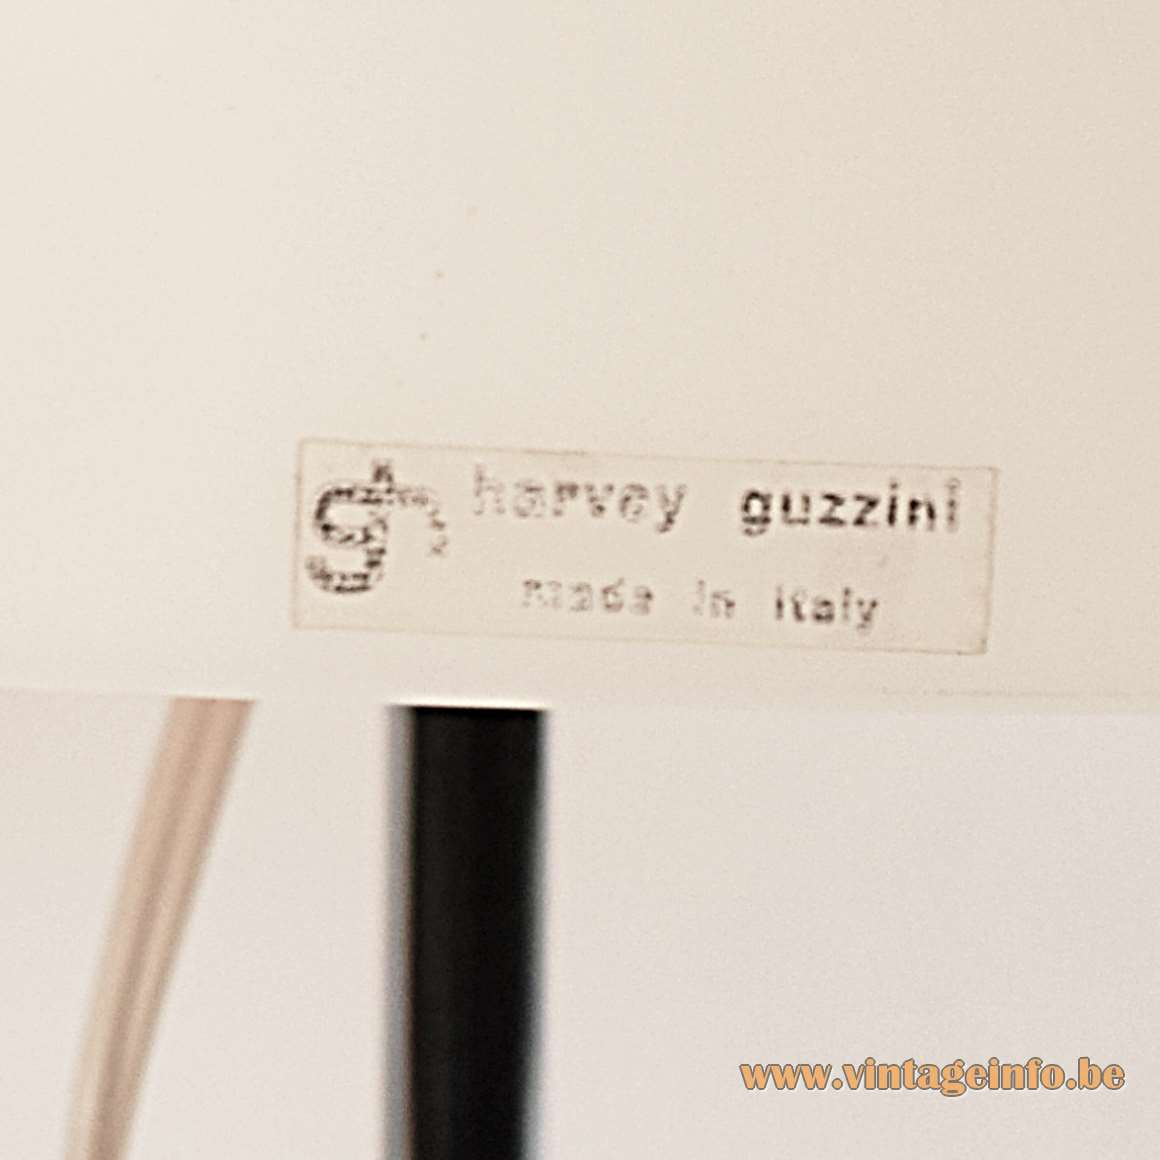 Harvey Guzzini Faro Table Lamps acrylic round mushroom lampshades chrome base & rod 1960s 1970s MCM